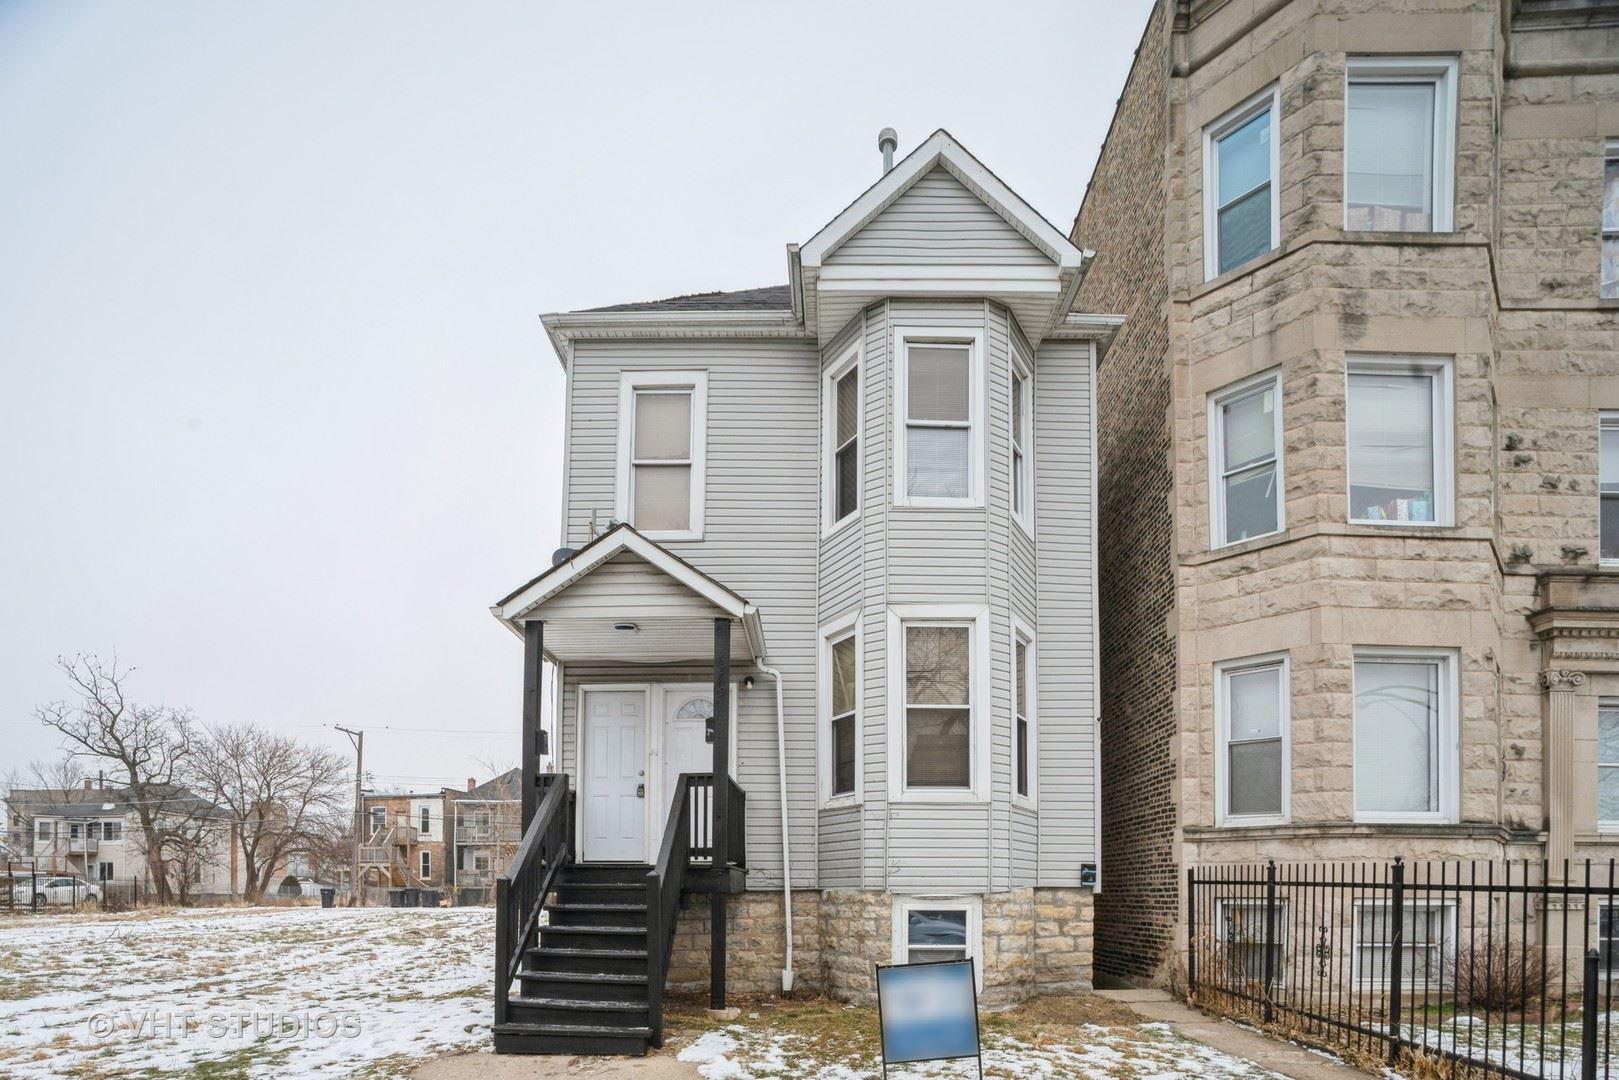 6349 S Langley Avenue, Chicago, IL 60637 - #: 10961656